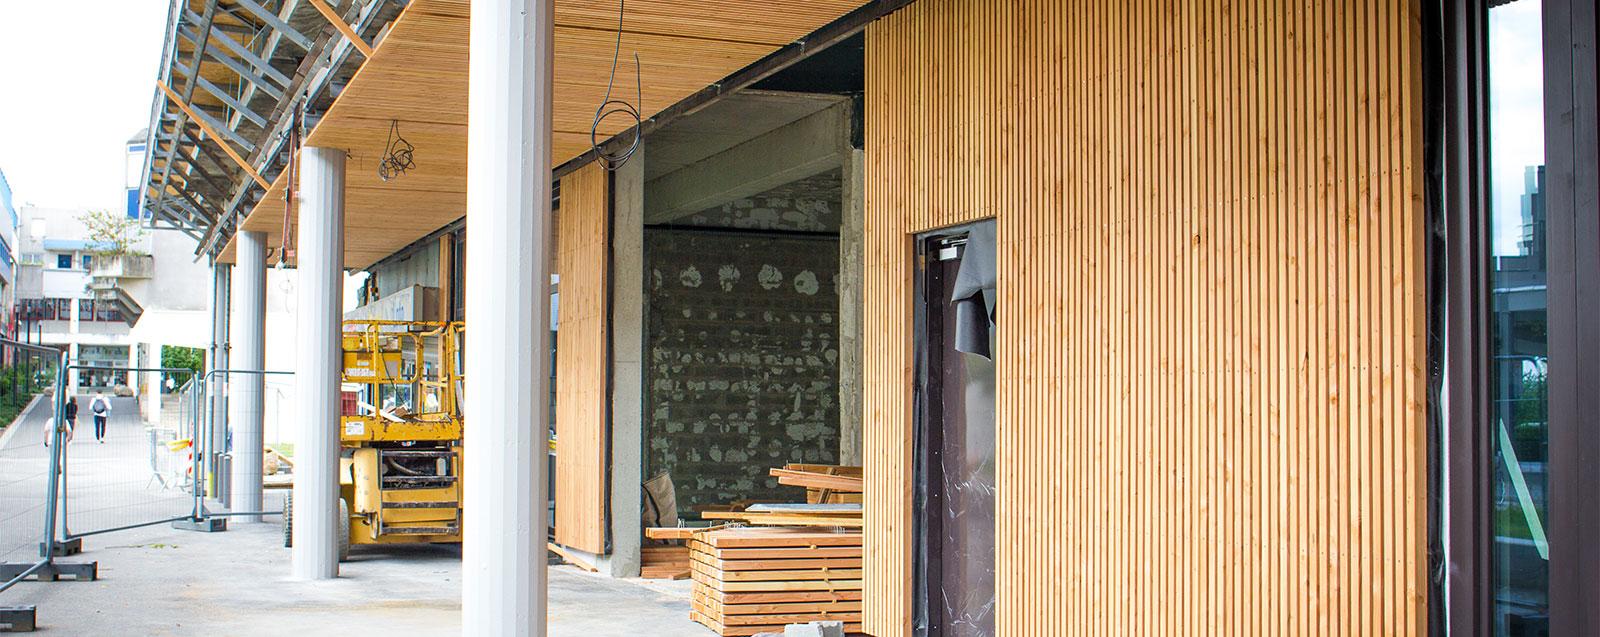 Illustration-slider-patio